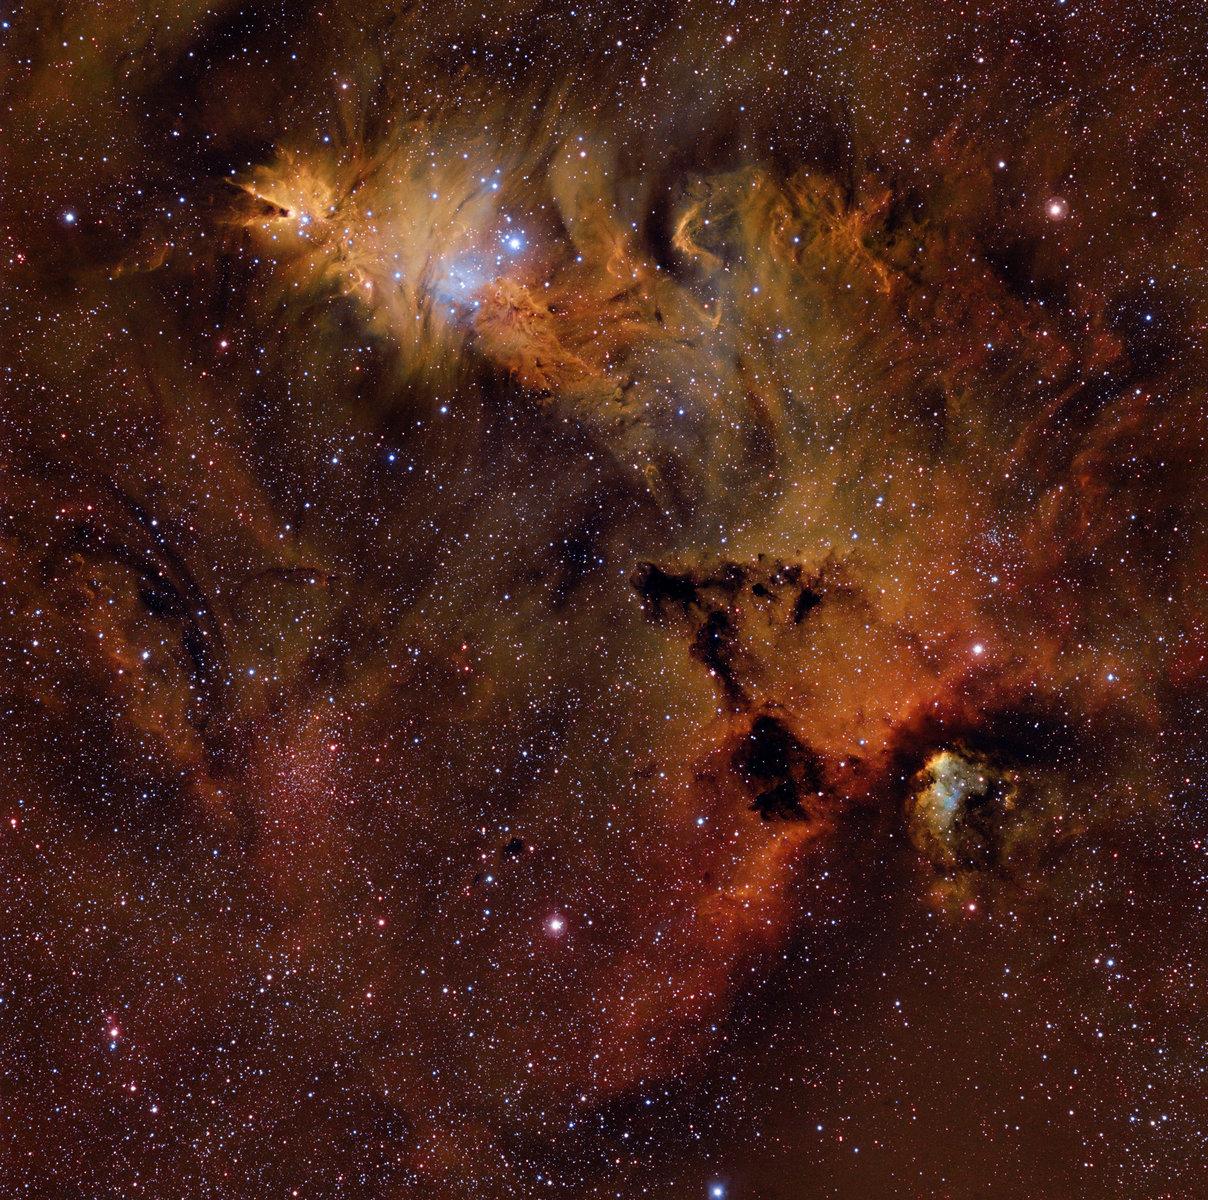 5aaa640107c42_NGC2264HSOv11800j.thumb.jpg.1111264f9e4b1f76d01207e9d2de7305.jpg